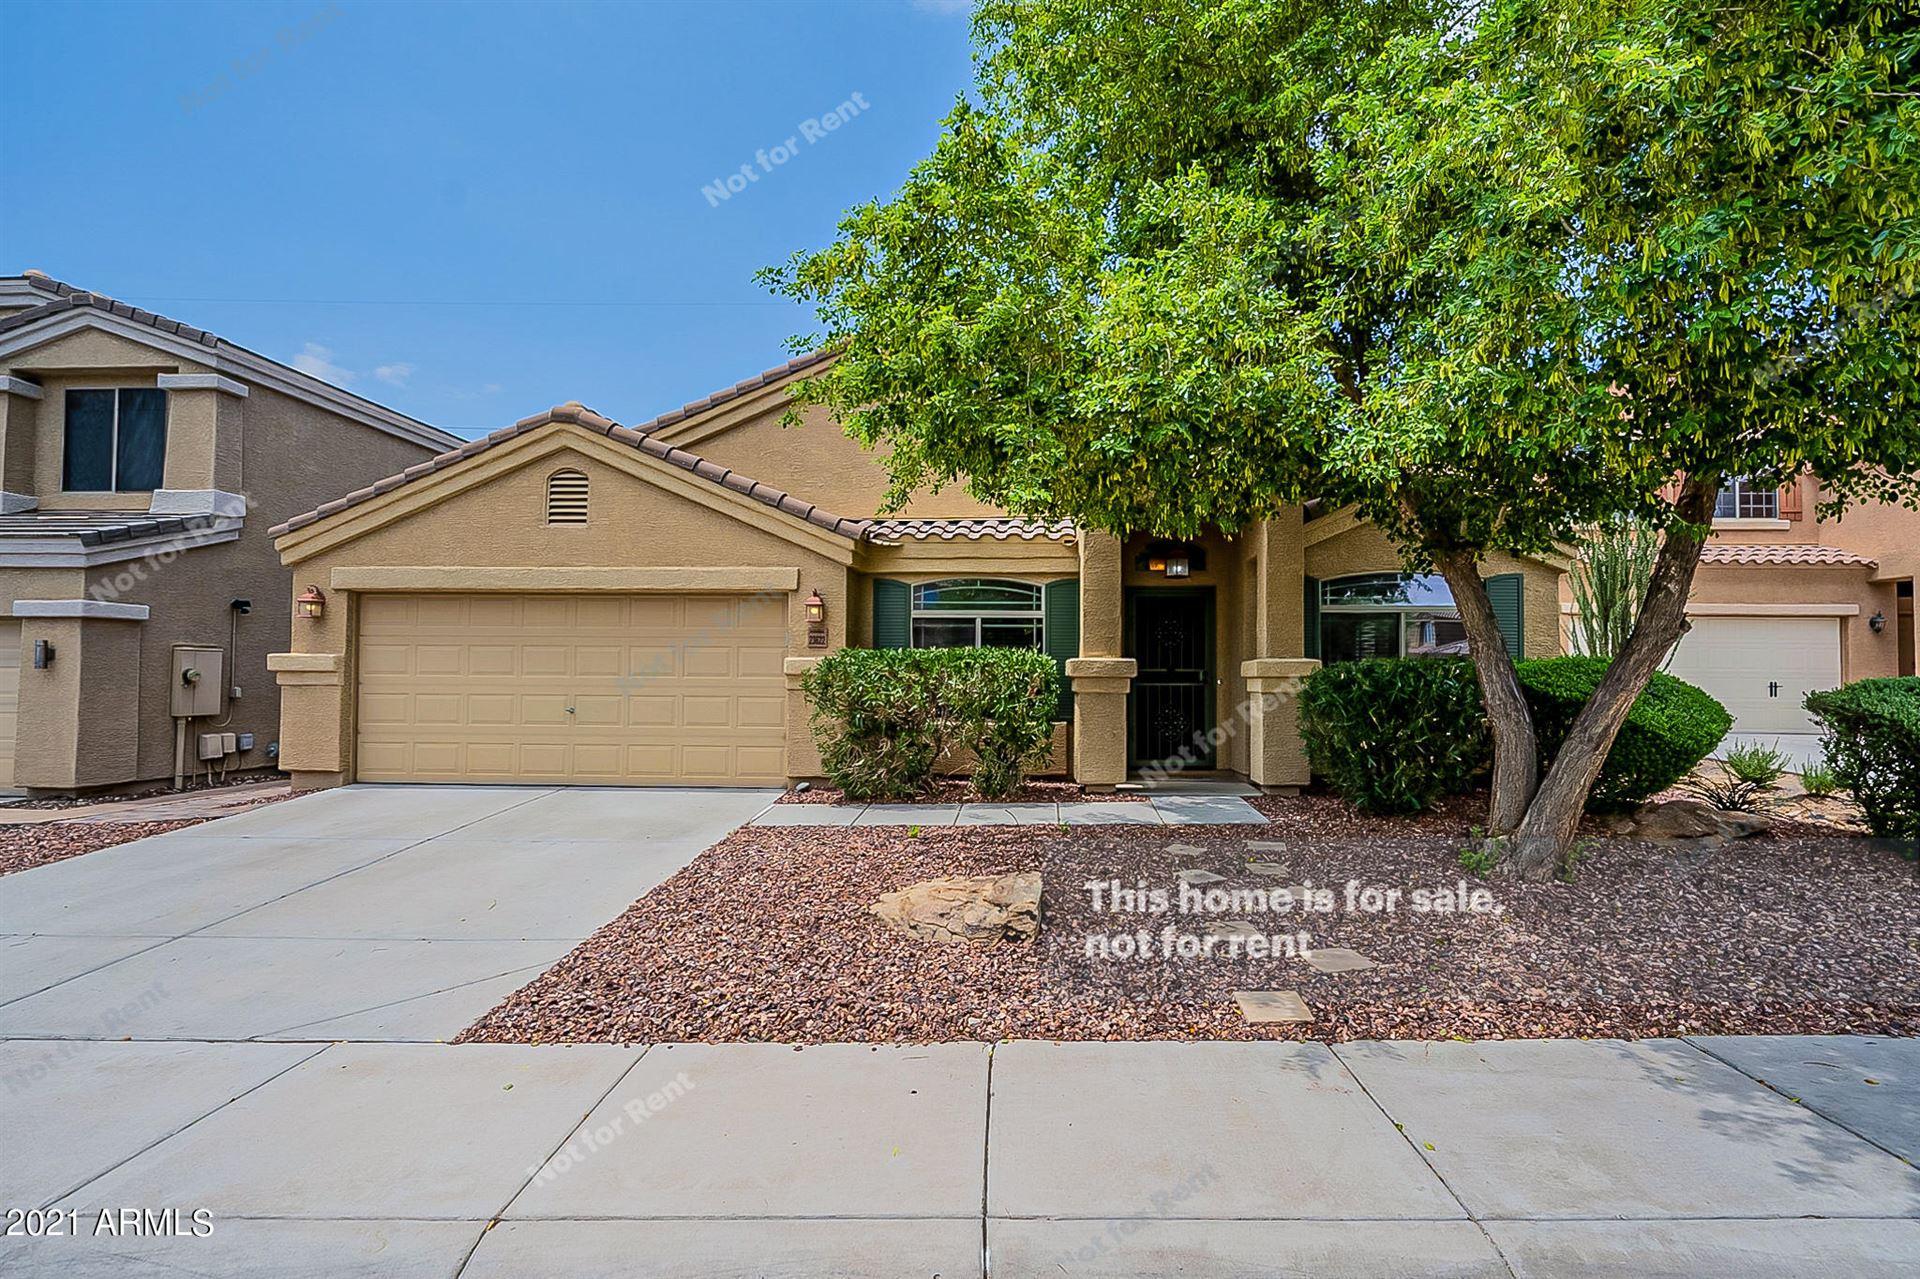 23622 N 24TH Terrace, Phoenix, AZ 85024 - MLS#: 6266974